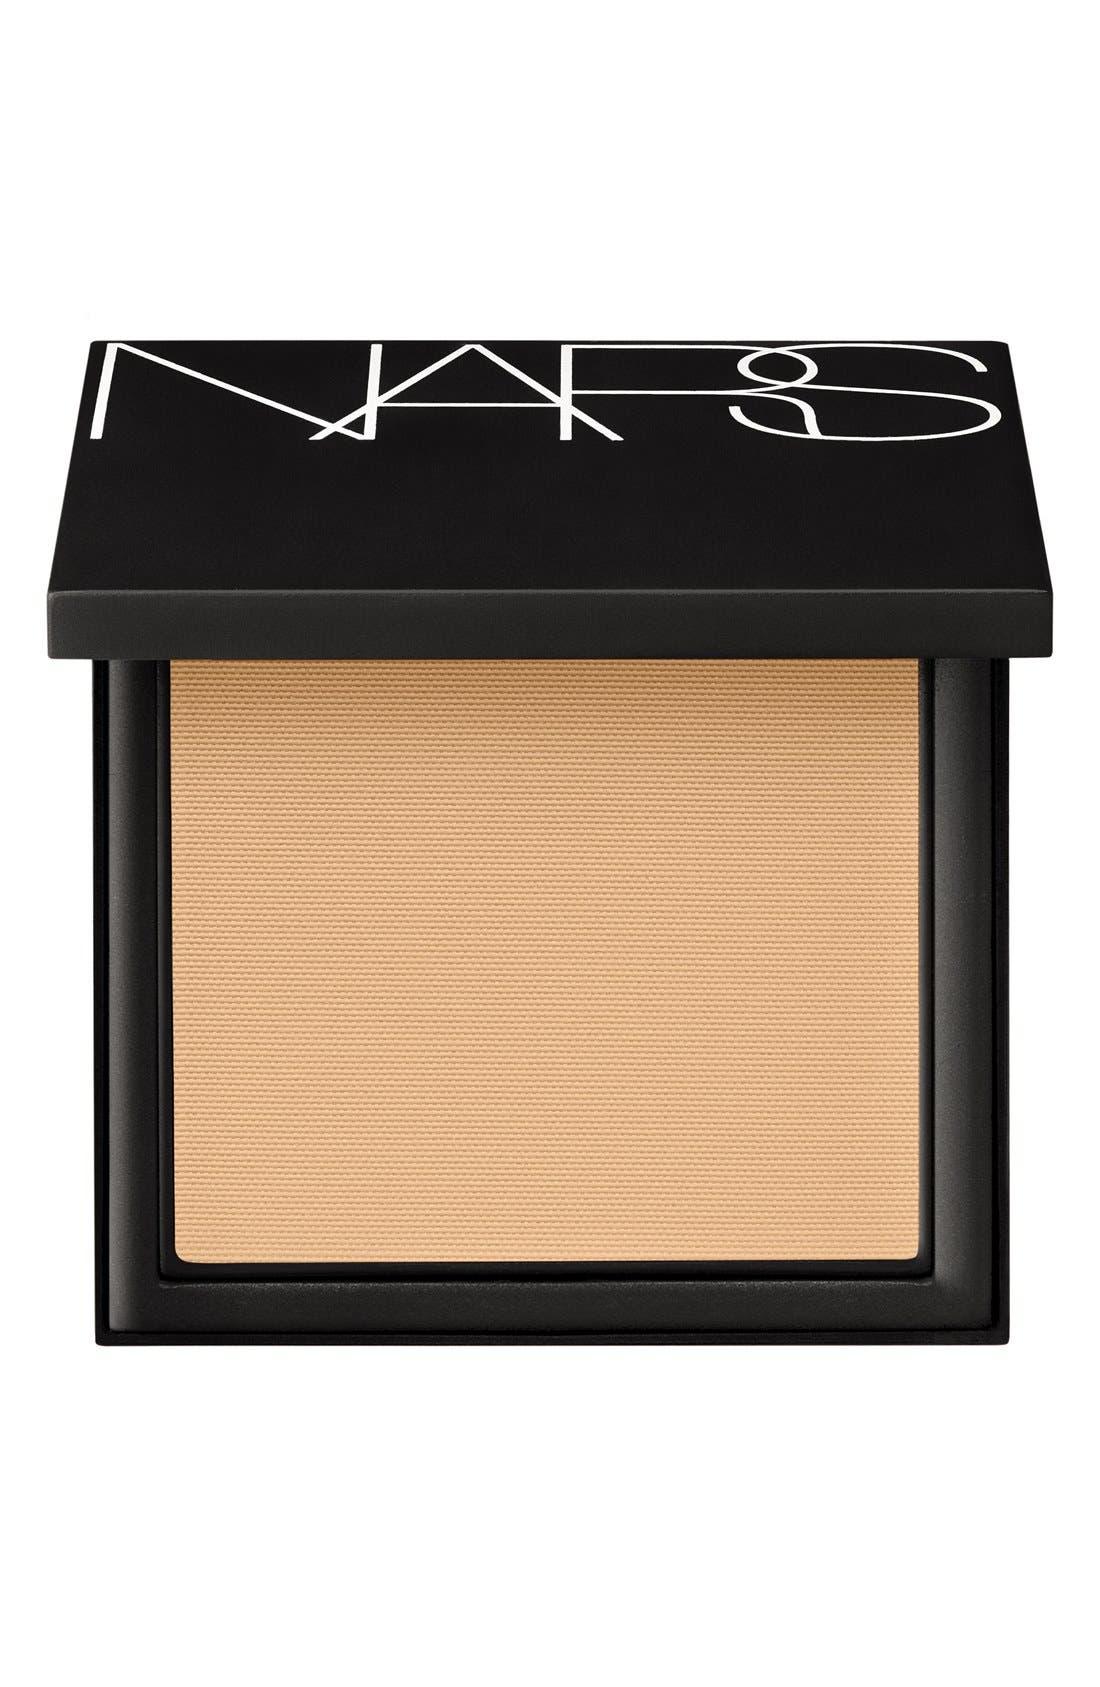 NARS All Day Luminous Powder Foundation SPF 24